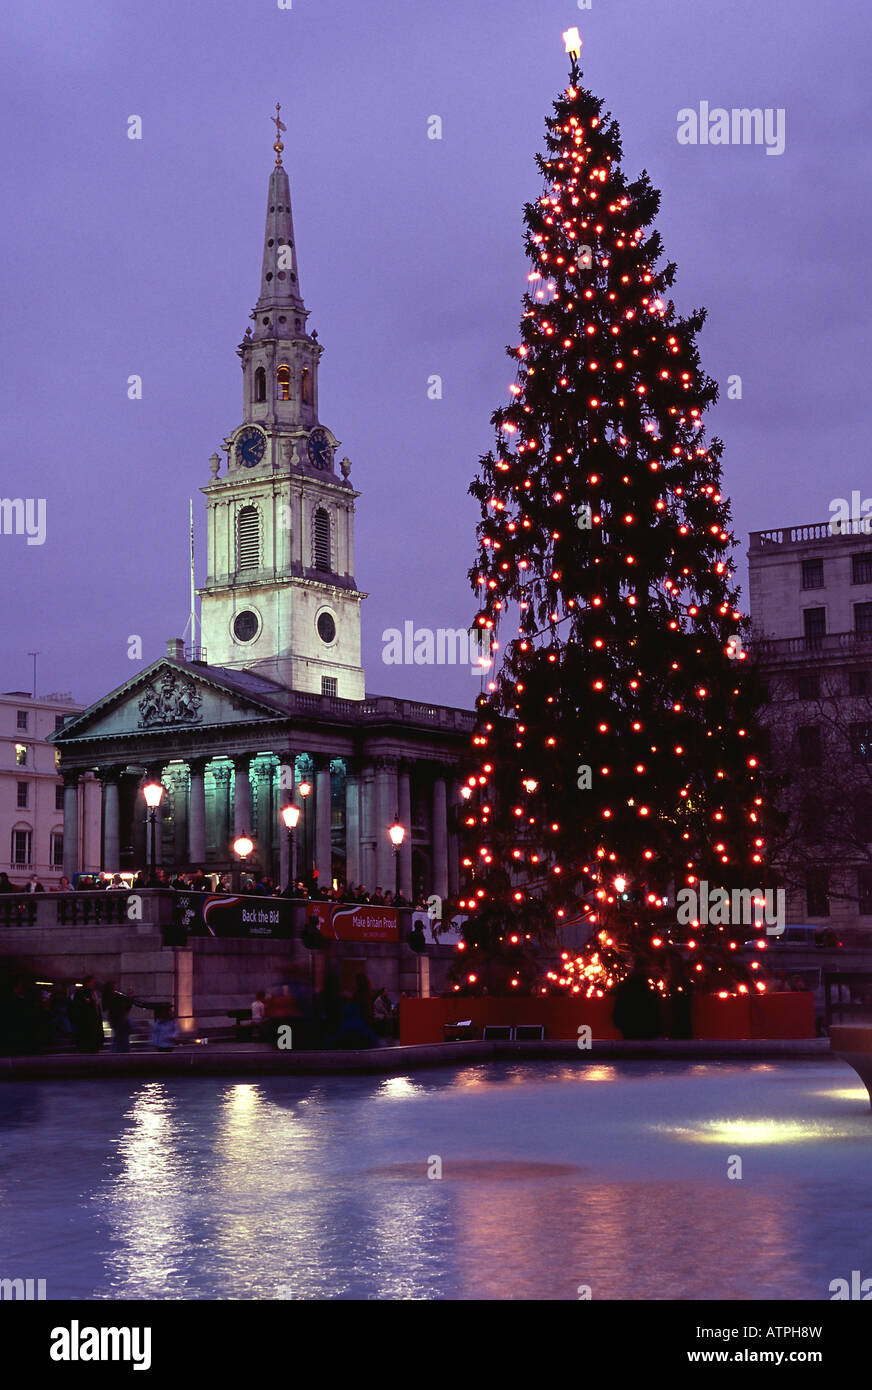 trafalgar square water fountains norway christmas tree night london ...